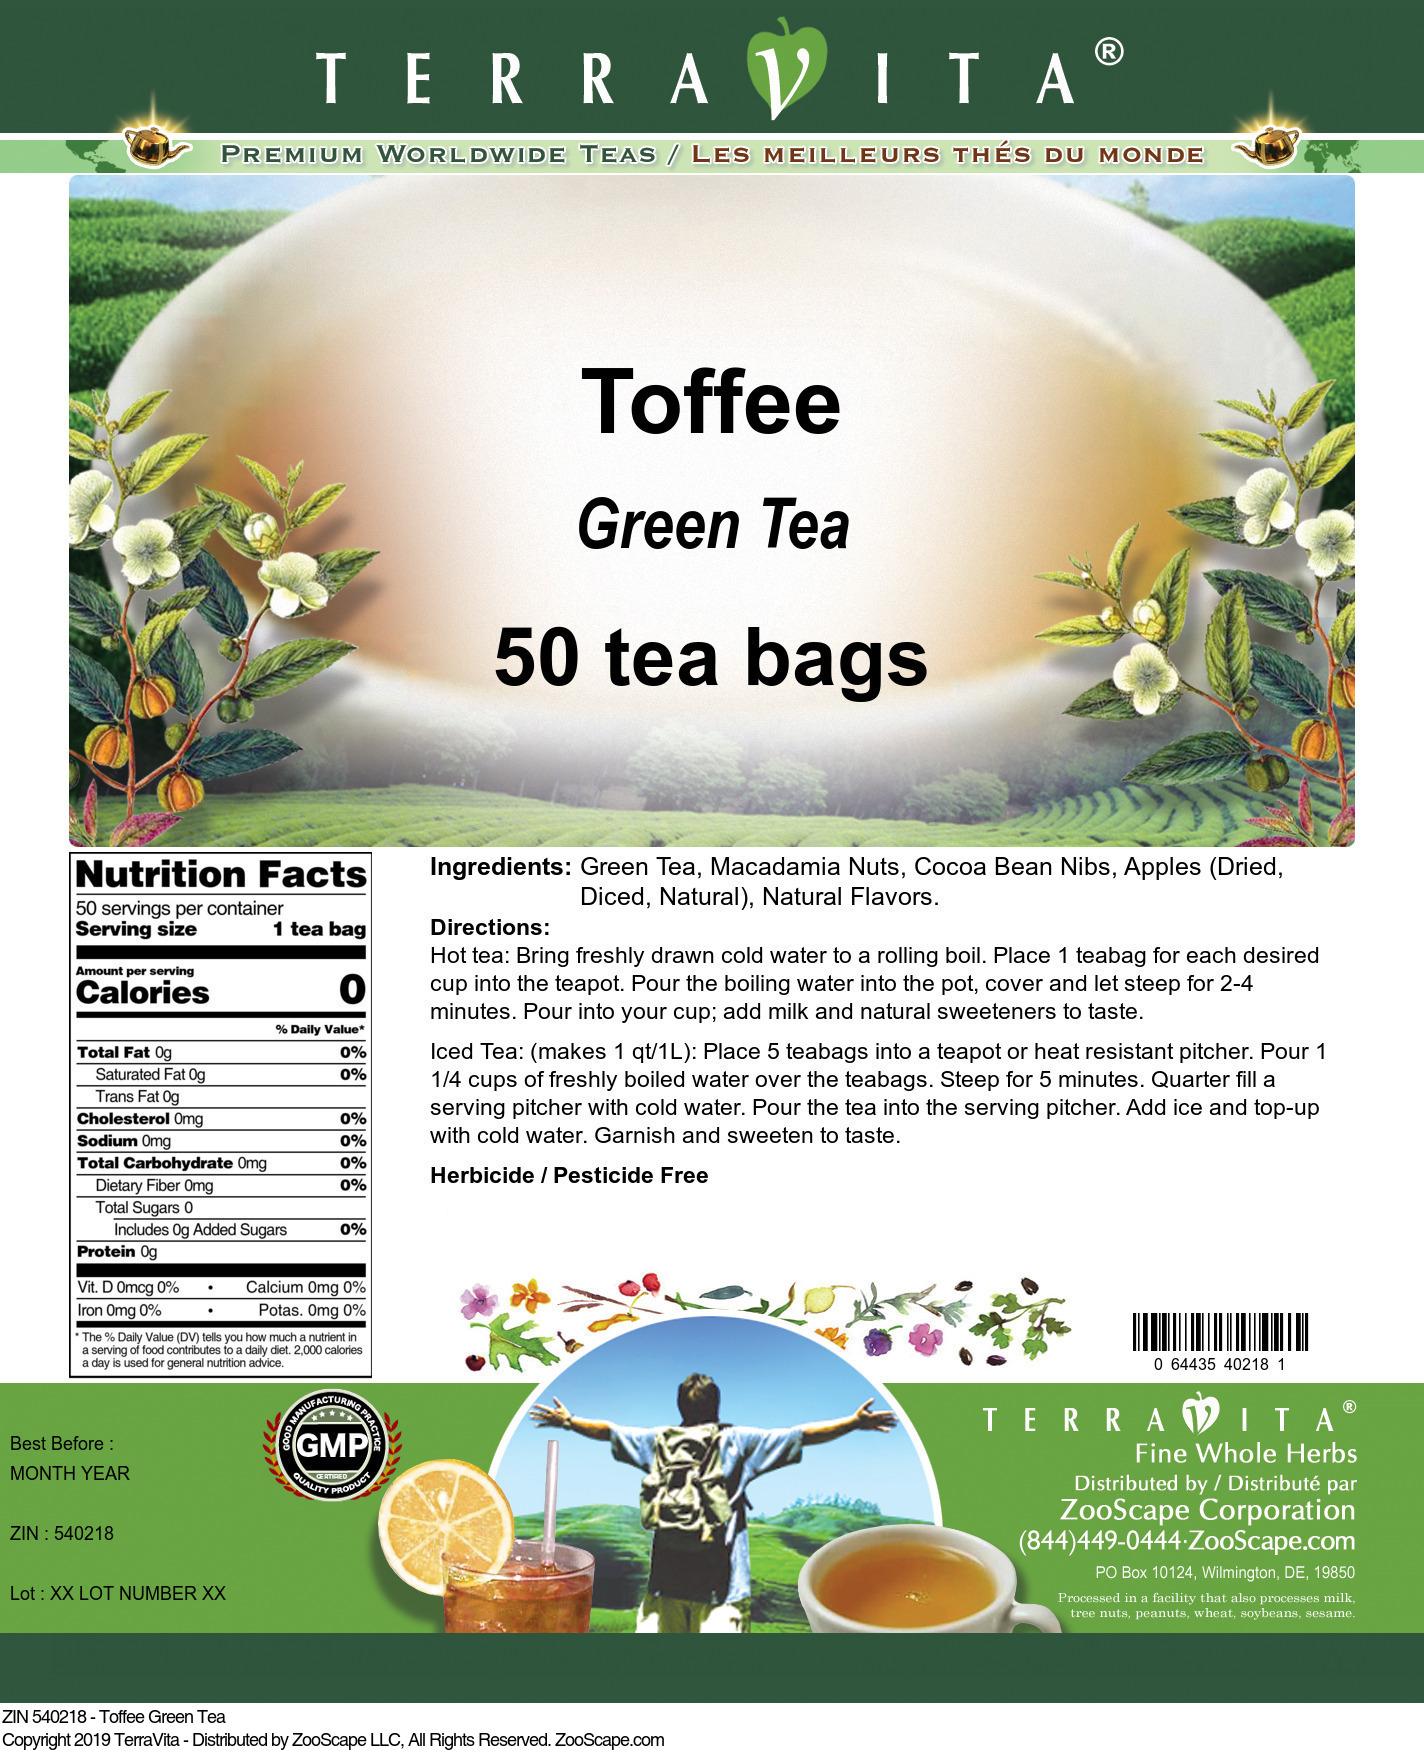 Toffee Green Tea